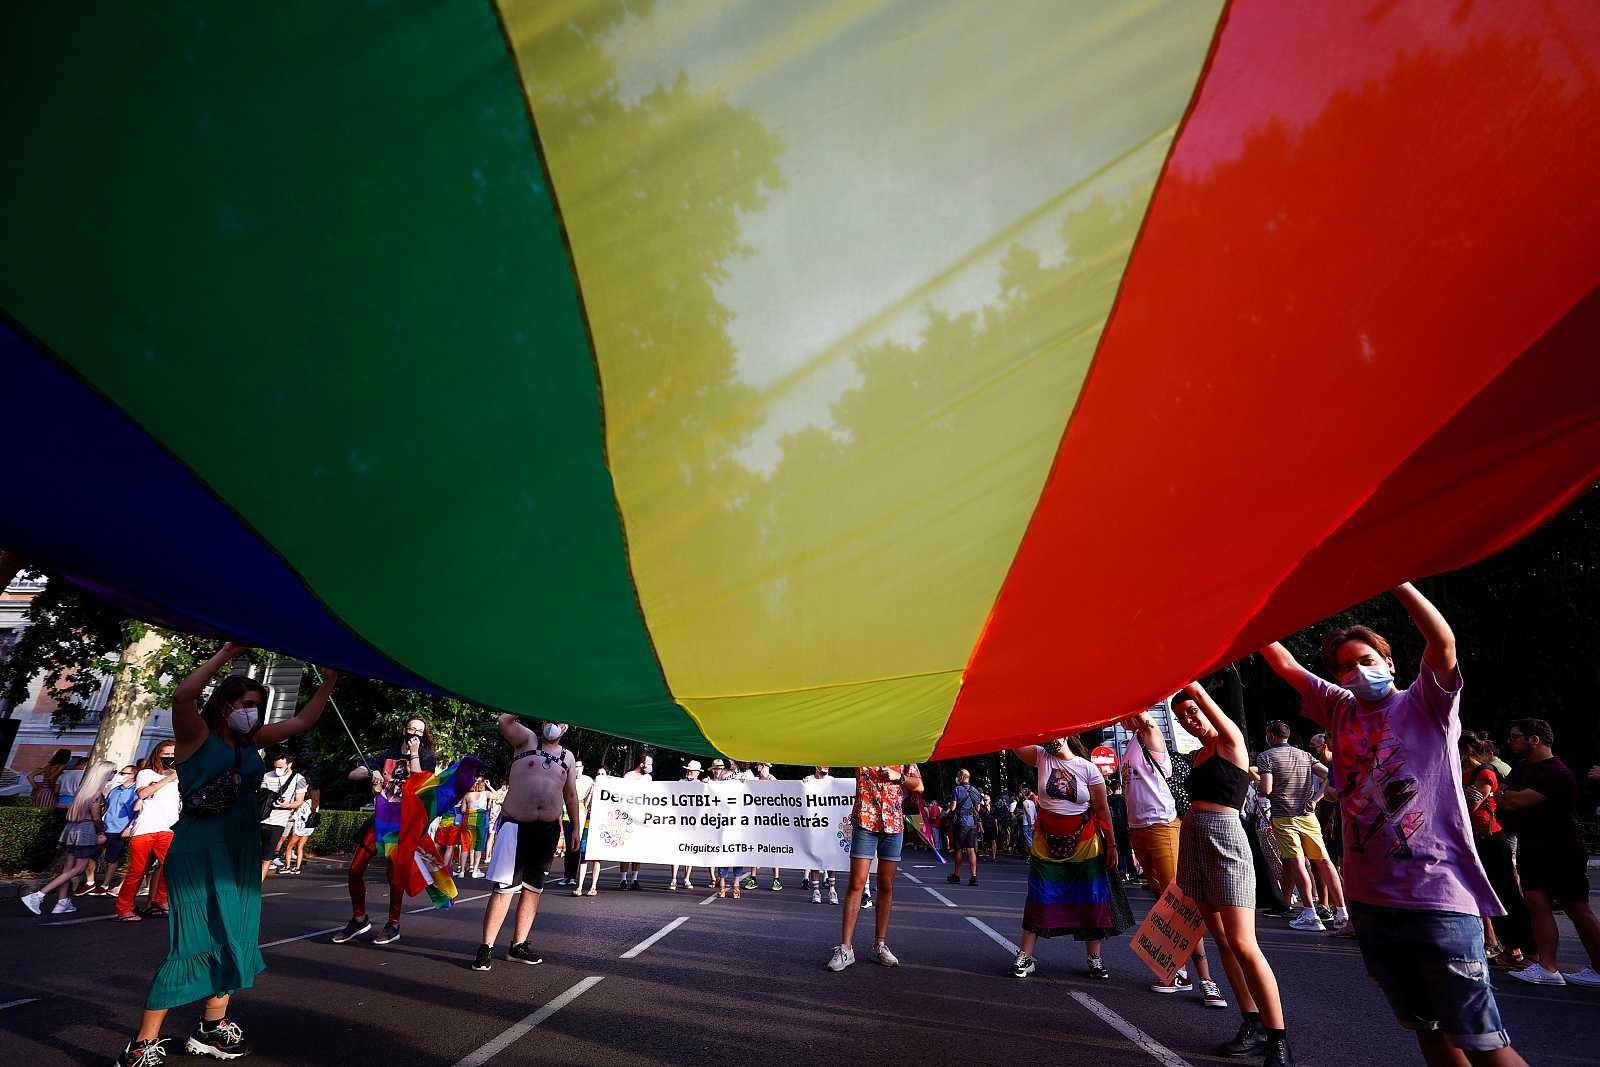 Participantes en la marcha del Orgullo LGTBI sostienen una enorme bandera del Orgullo.